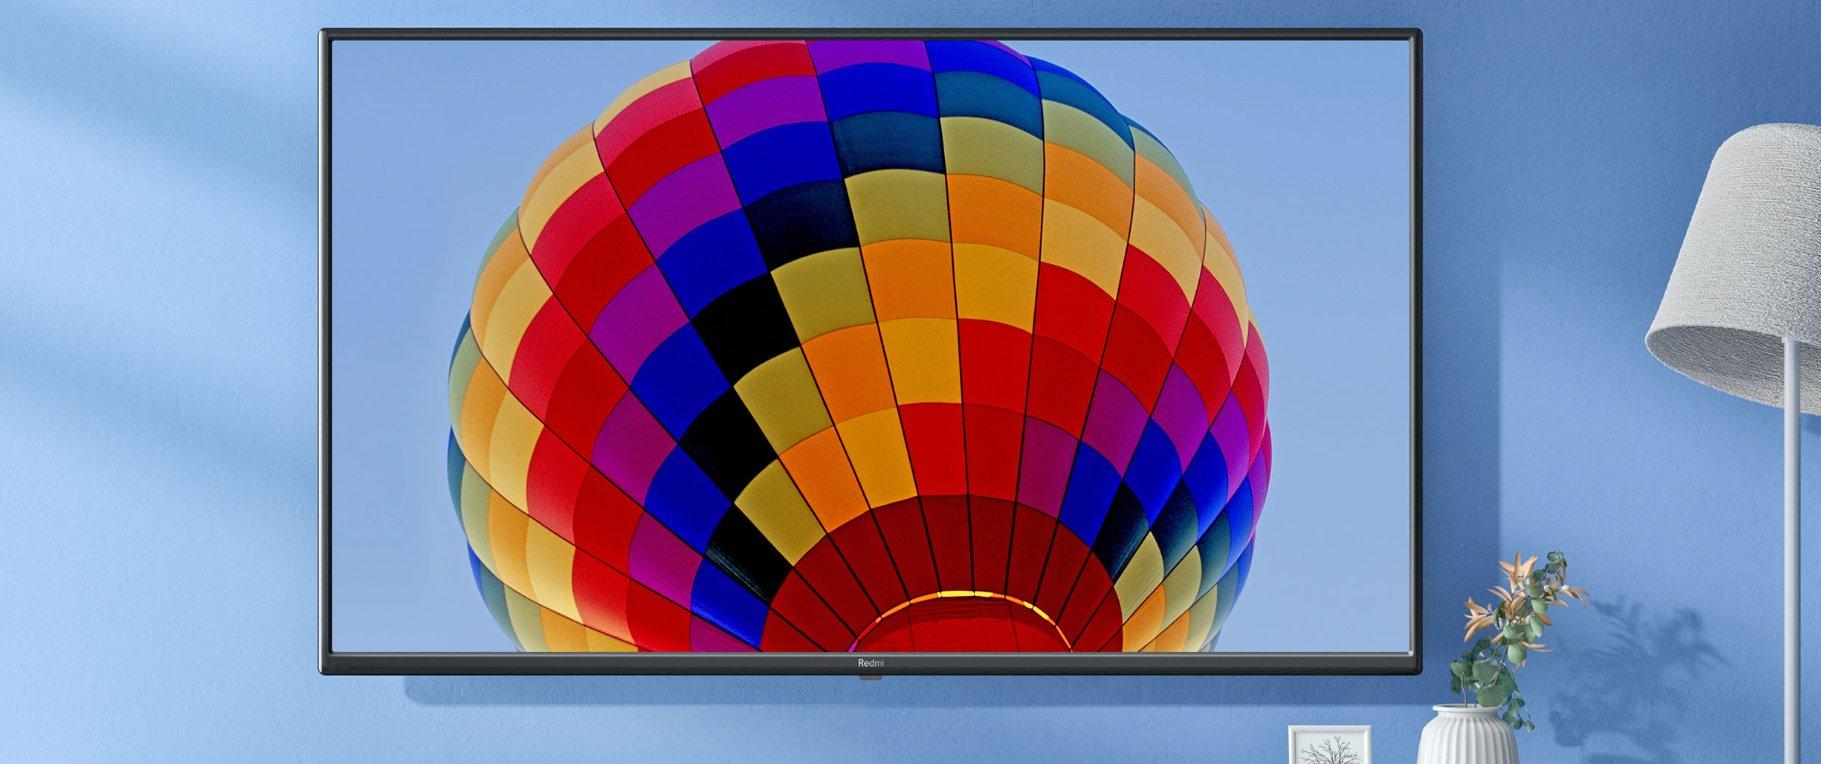 Redmi A32智能电视开售 售价仅需799元_-_热点资讯-艾德百科网